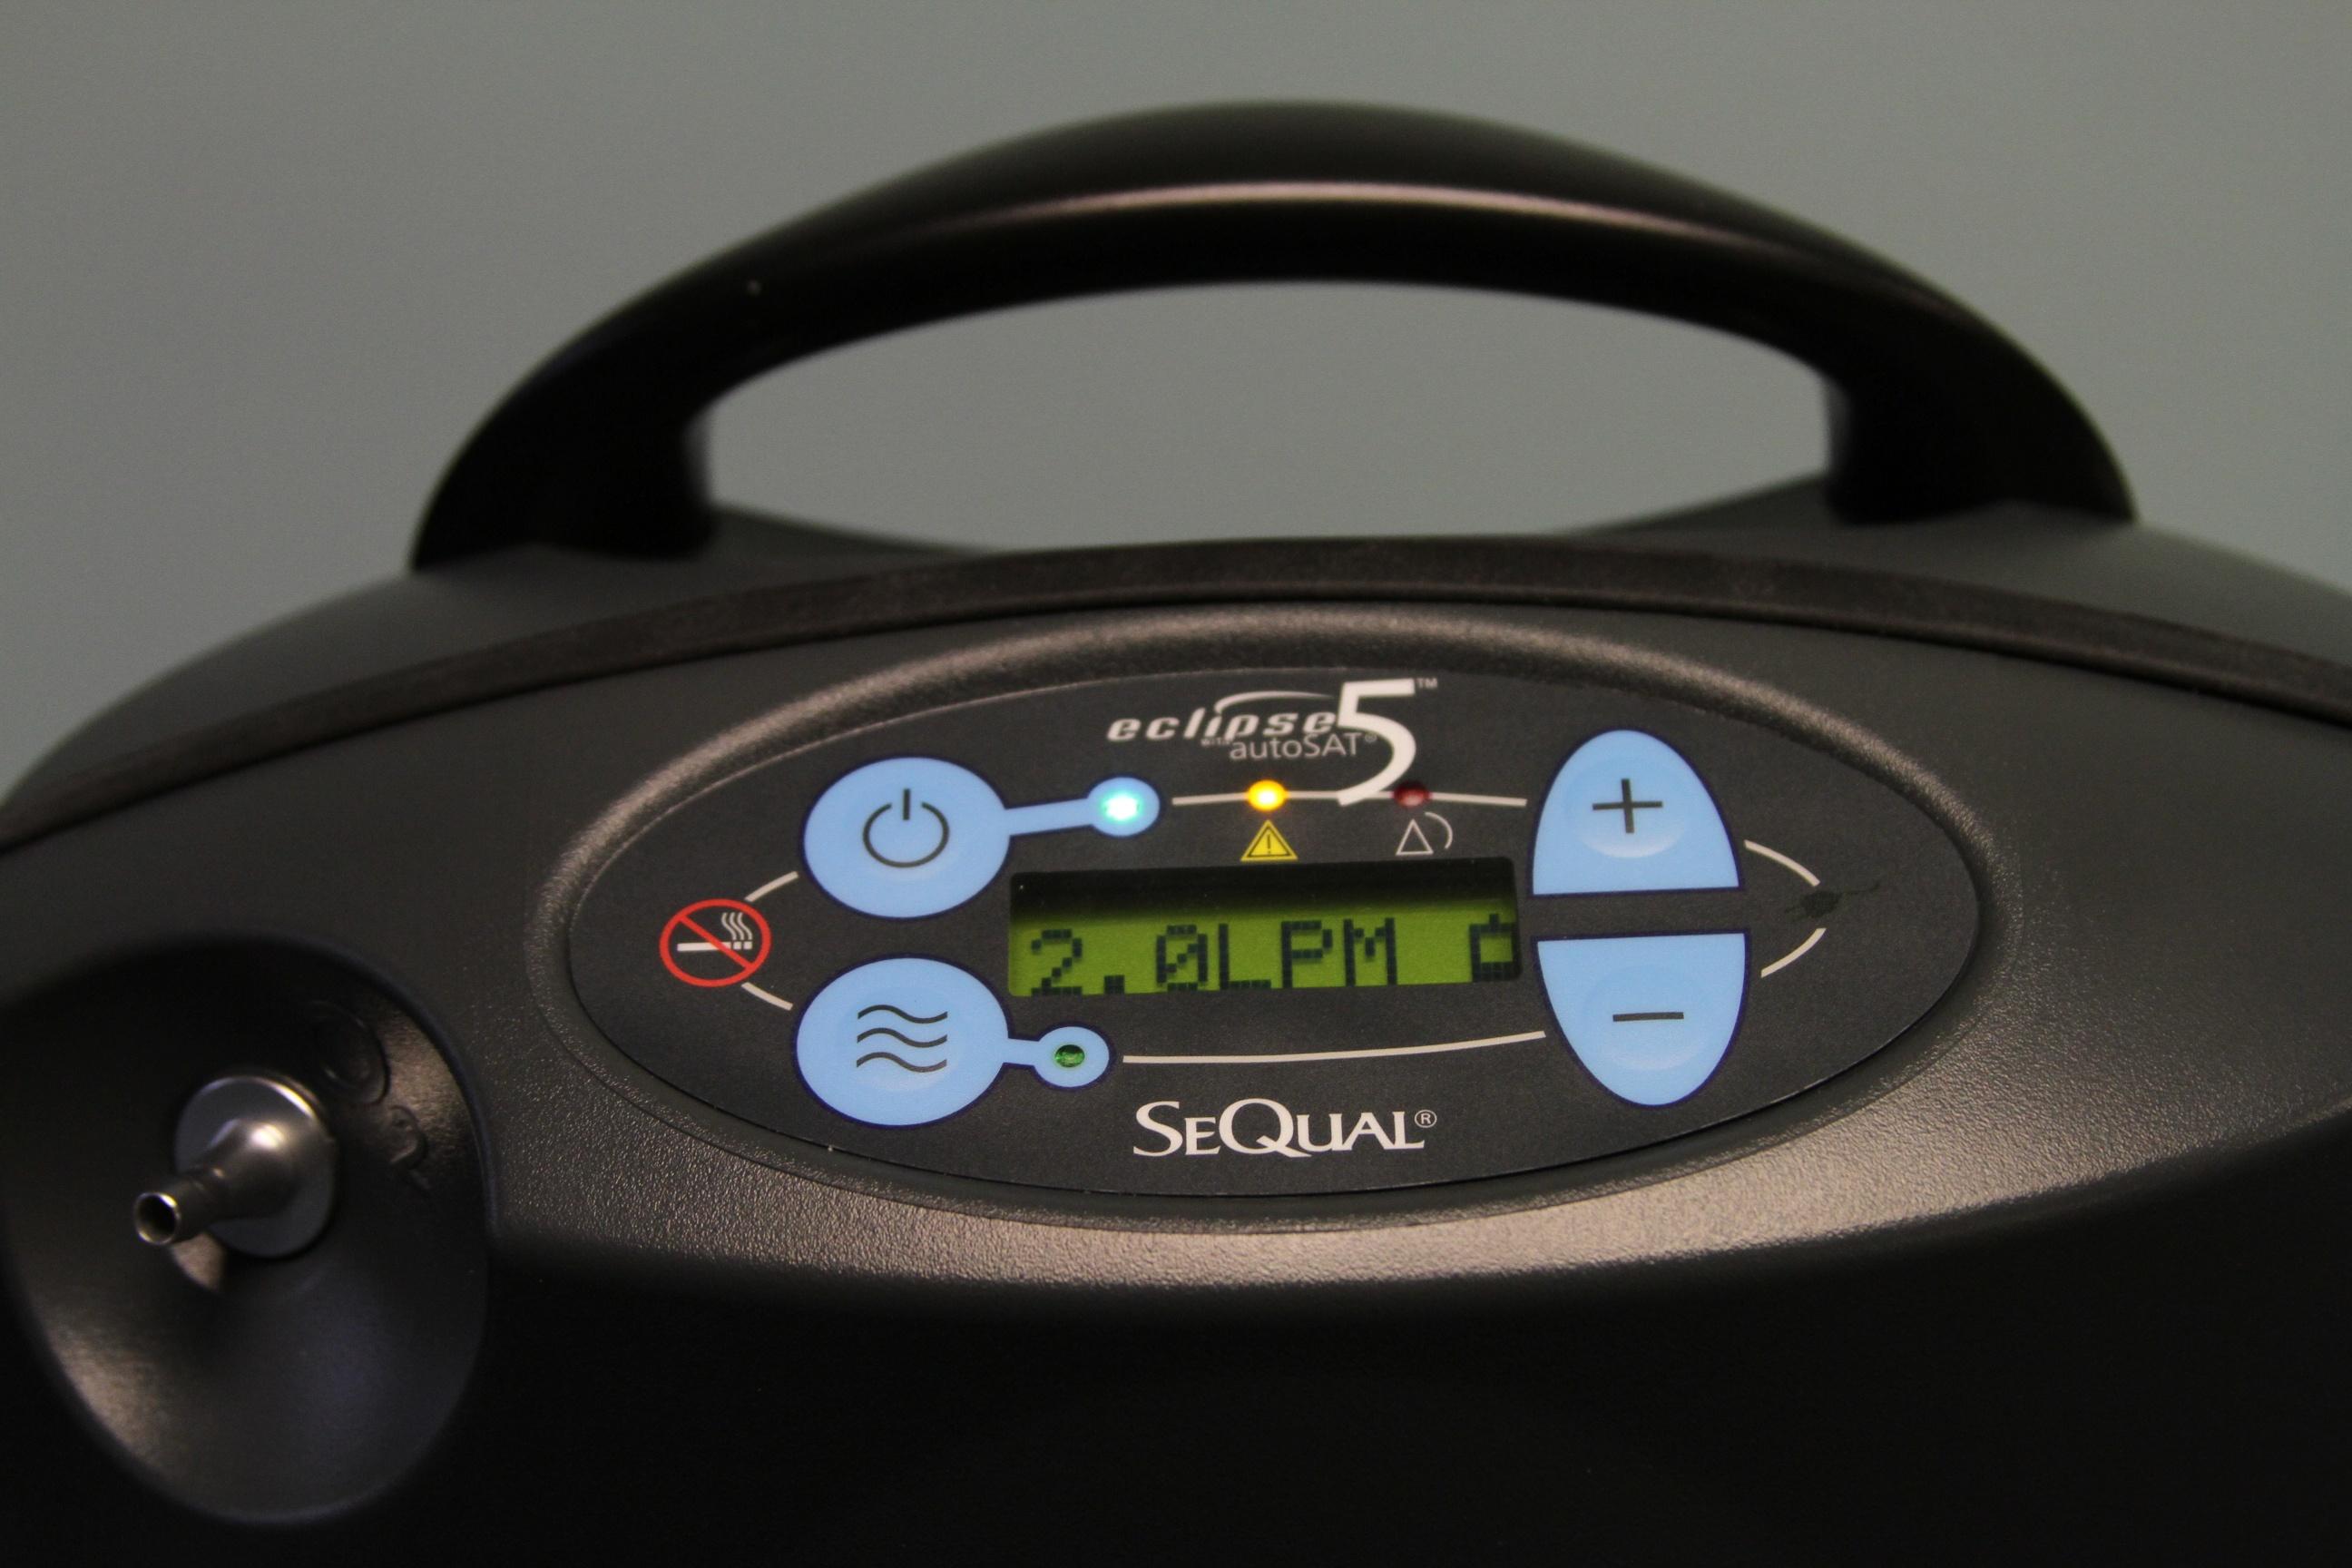 SeQual Eclipse 5 Control Panel